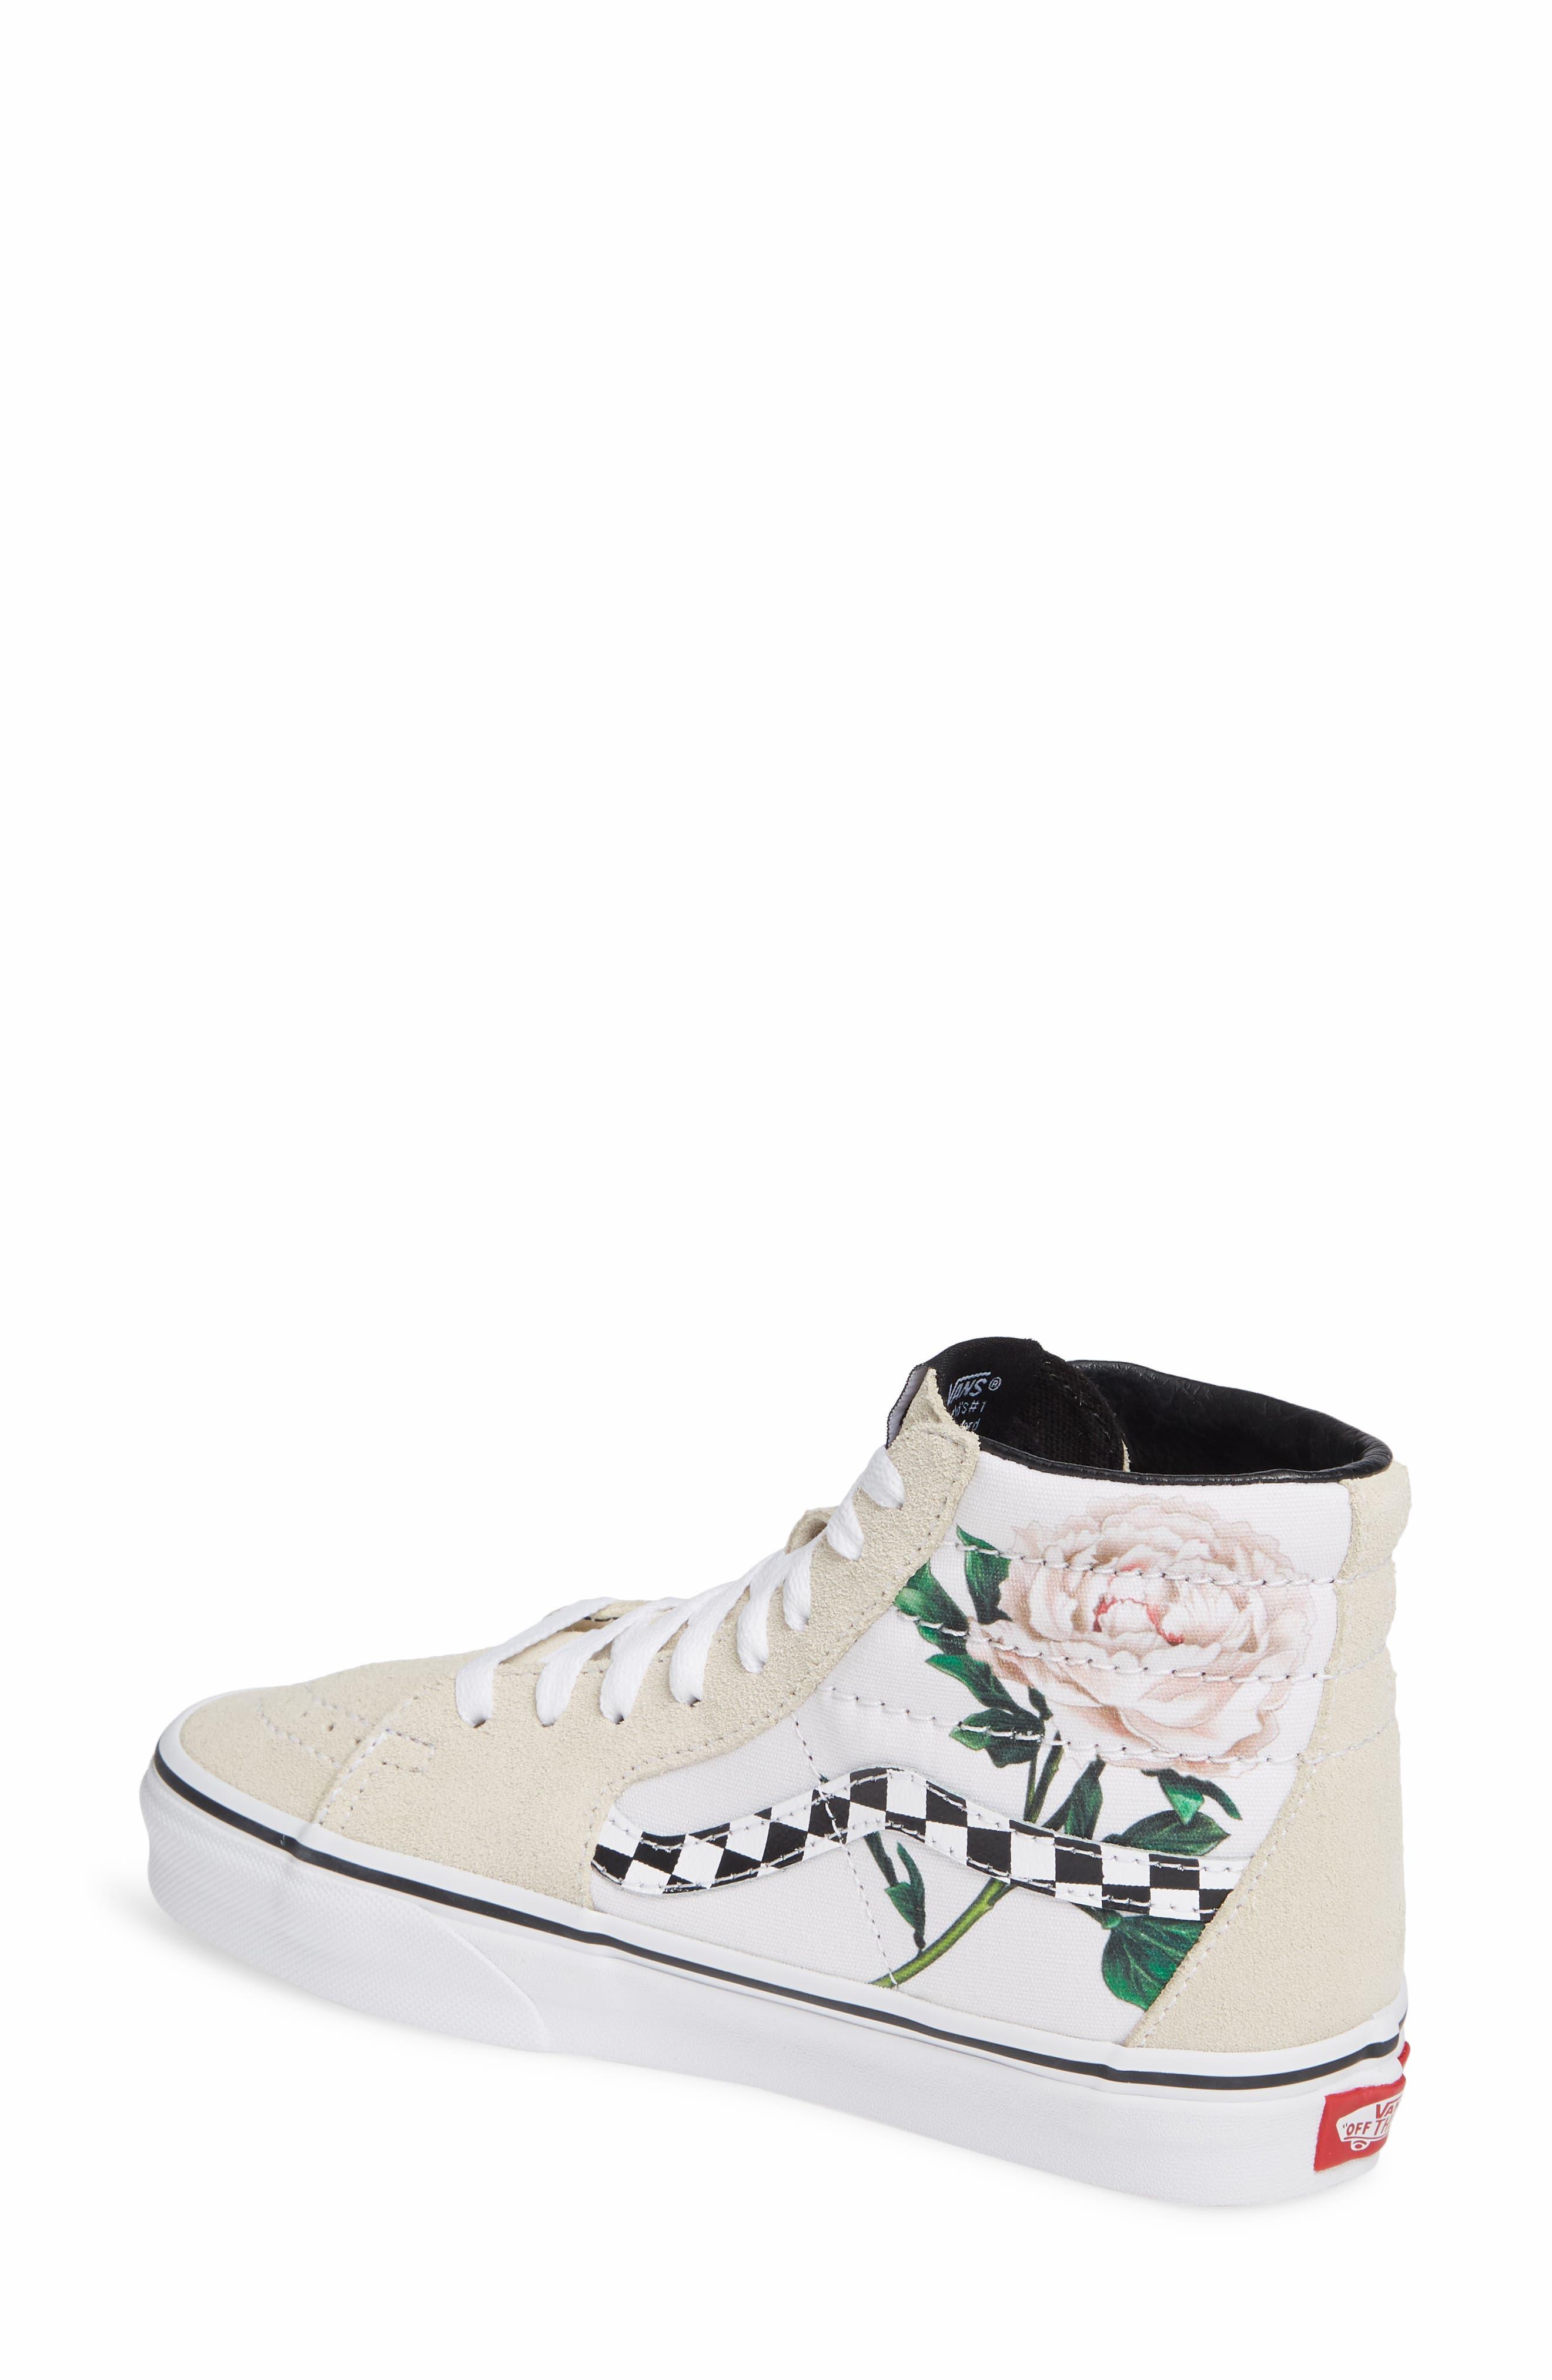 VANS,                             Sk8-Hi Checker Floral High Top Sneaker,                             Alternate thumbnail 2, color,                             CHECKER FLORAL TURTLEDOVE